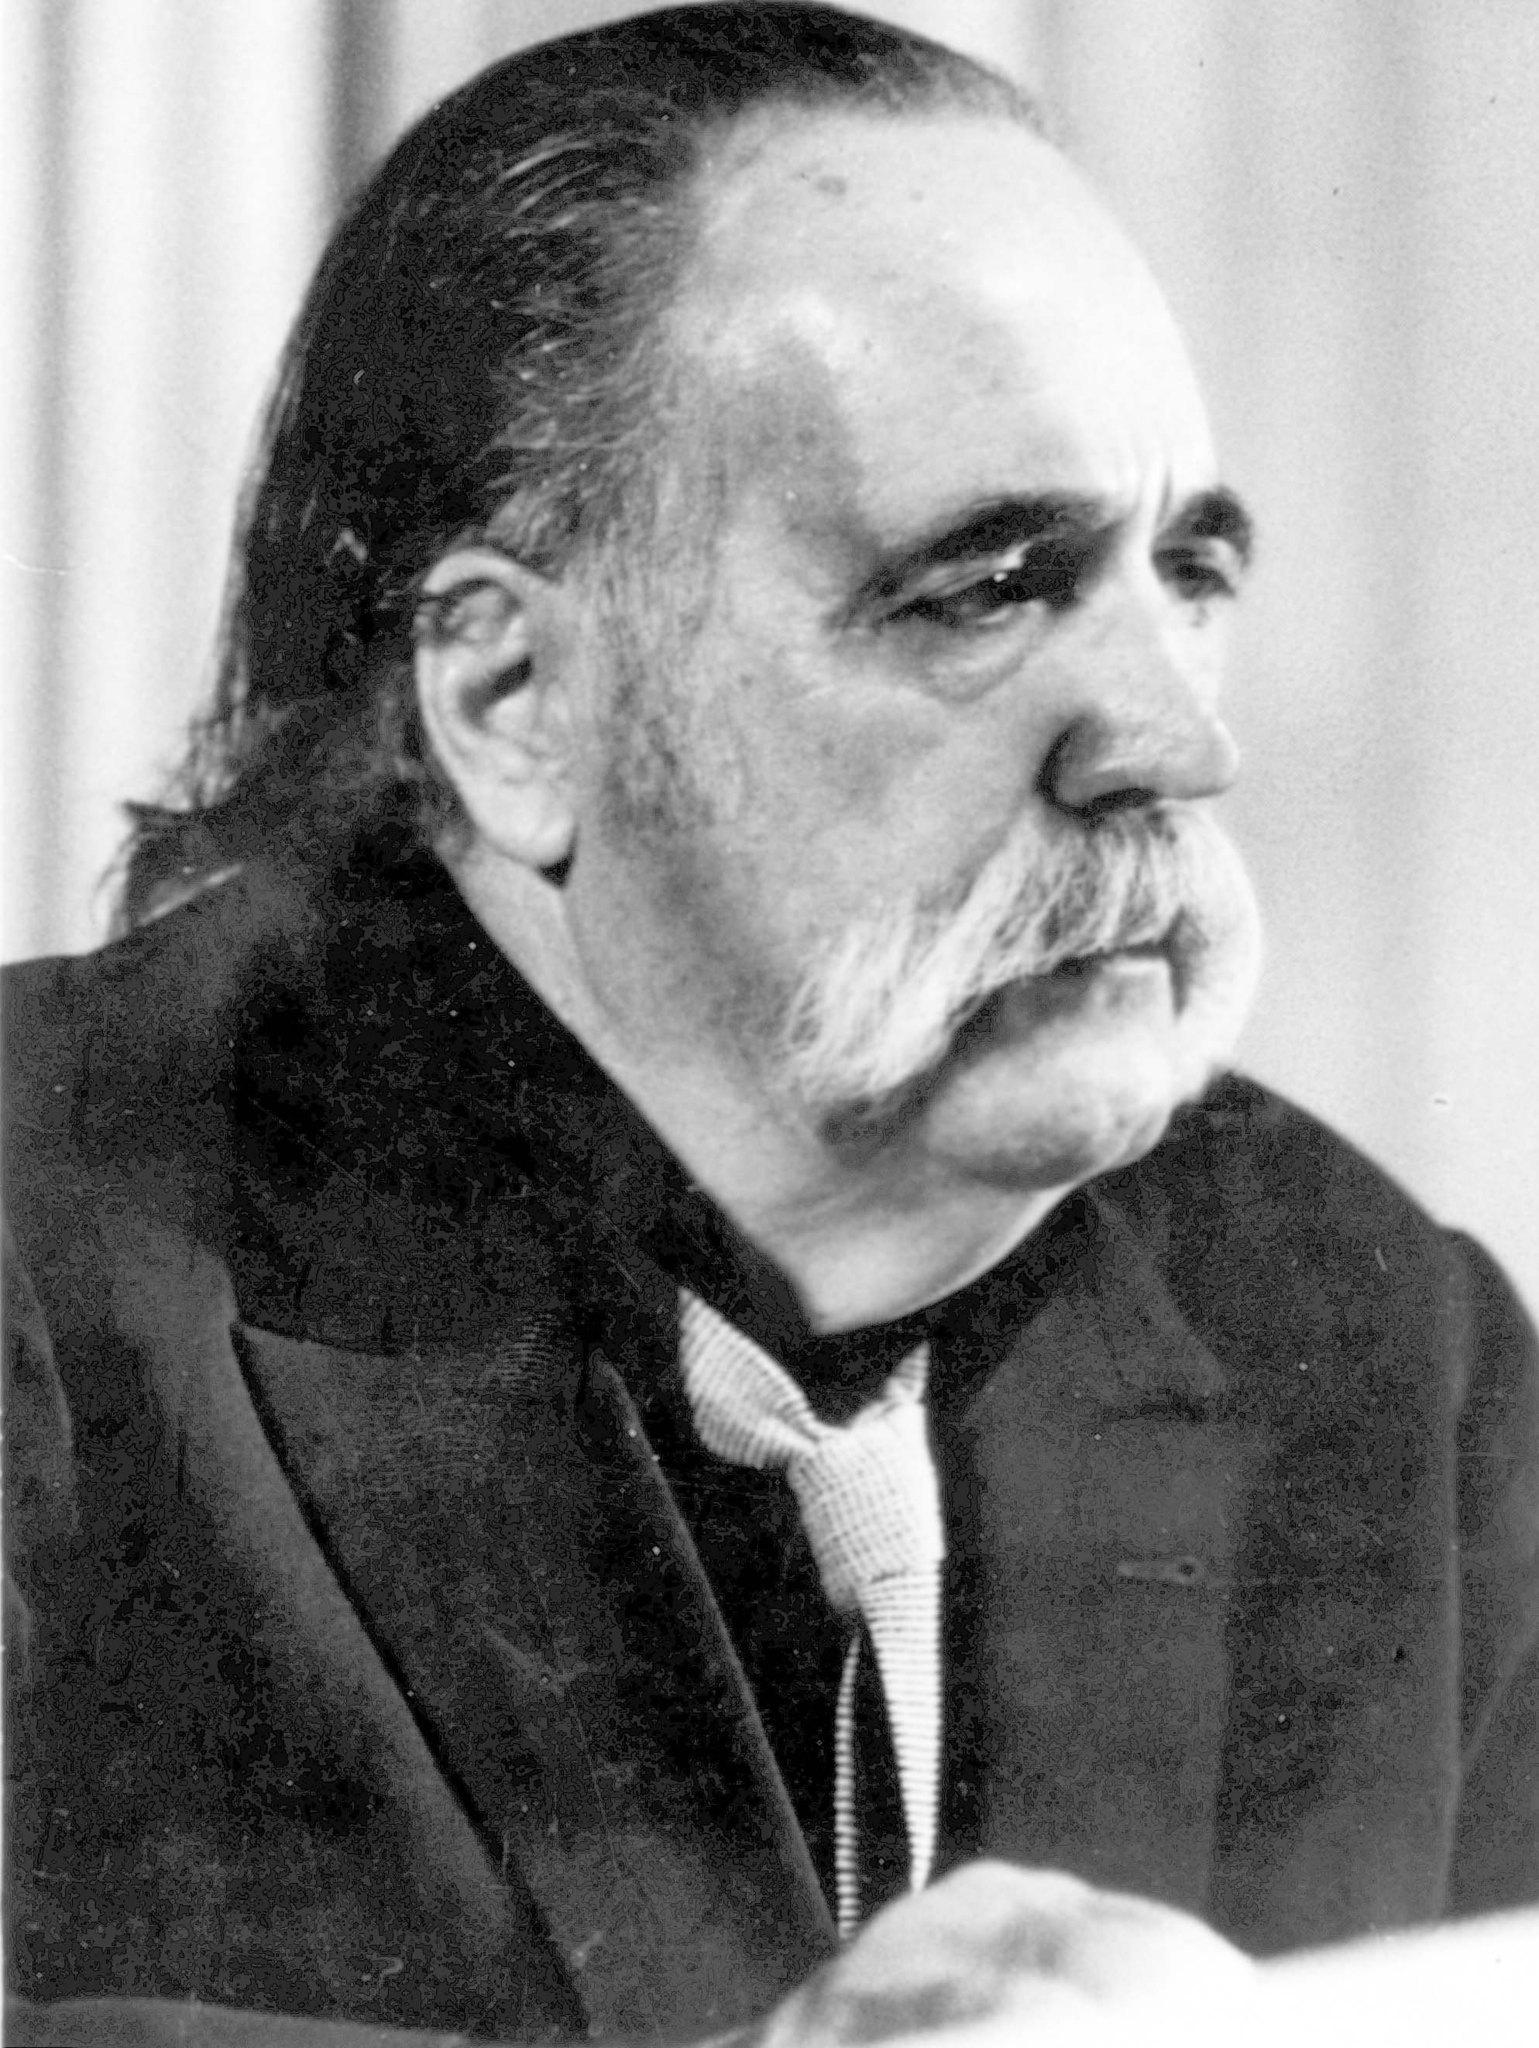 William Saroyan International Prize for Writing